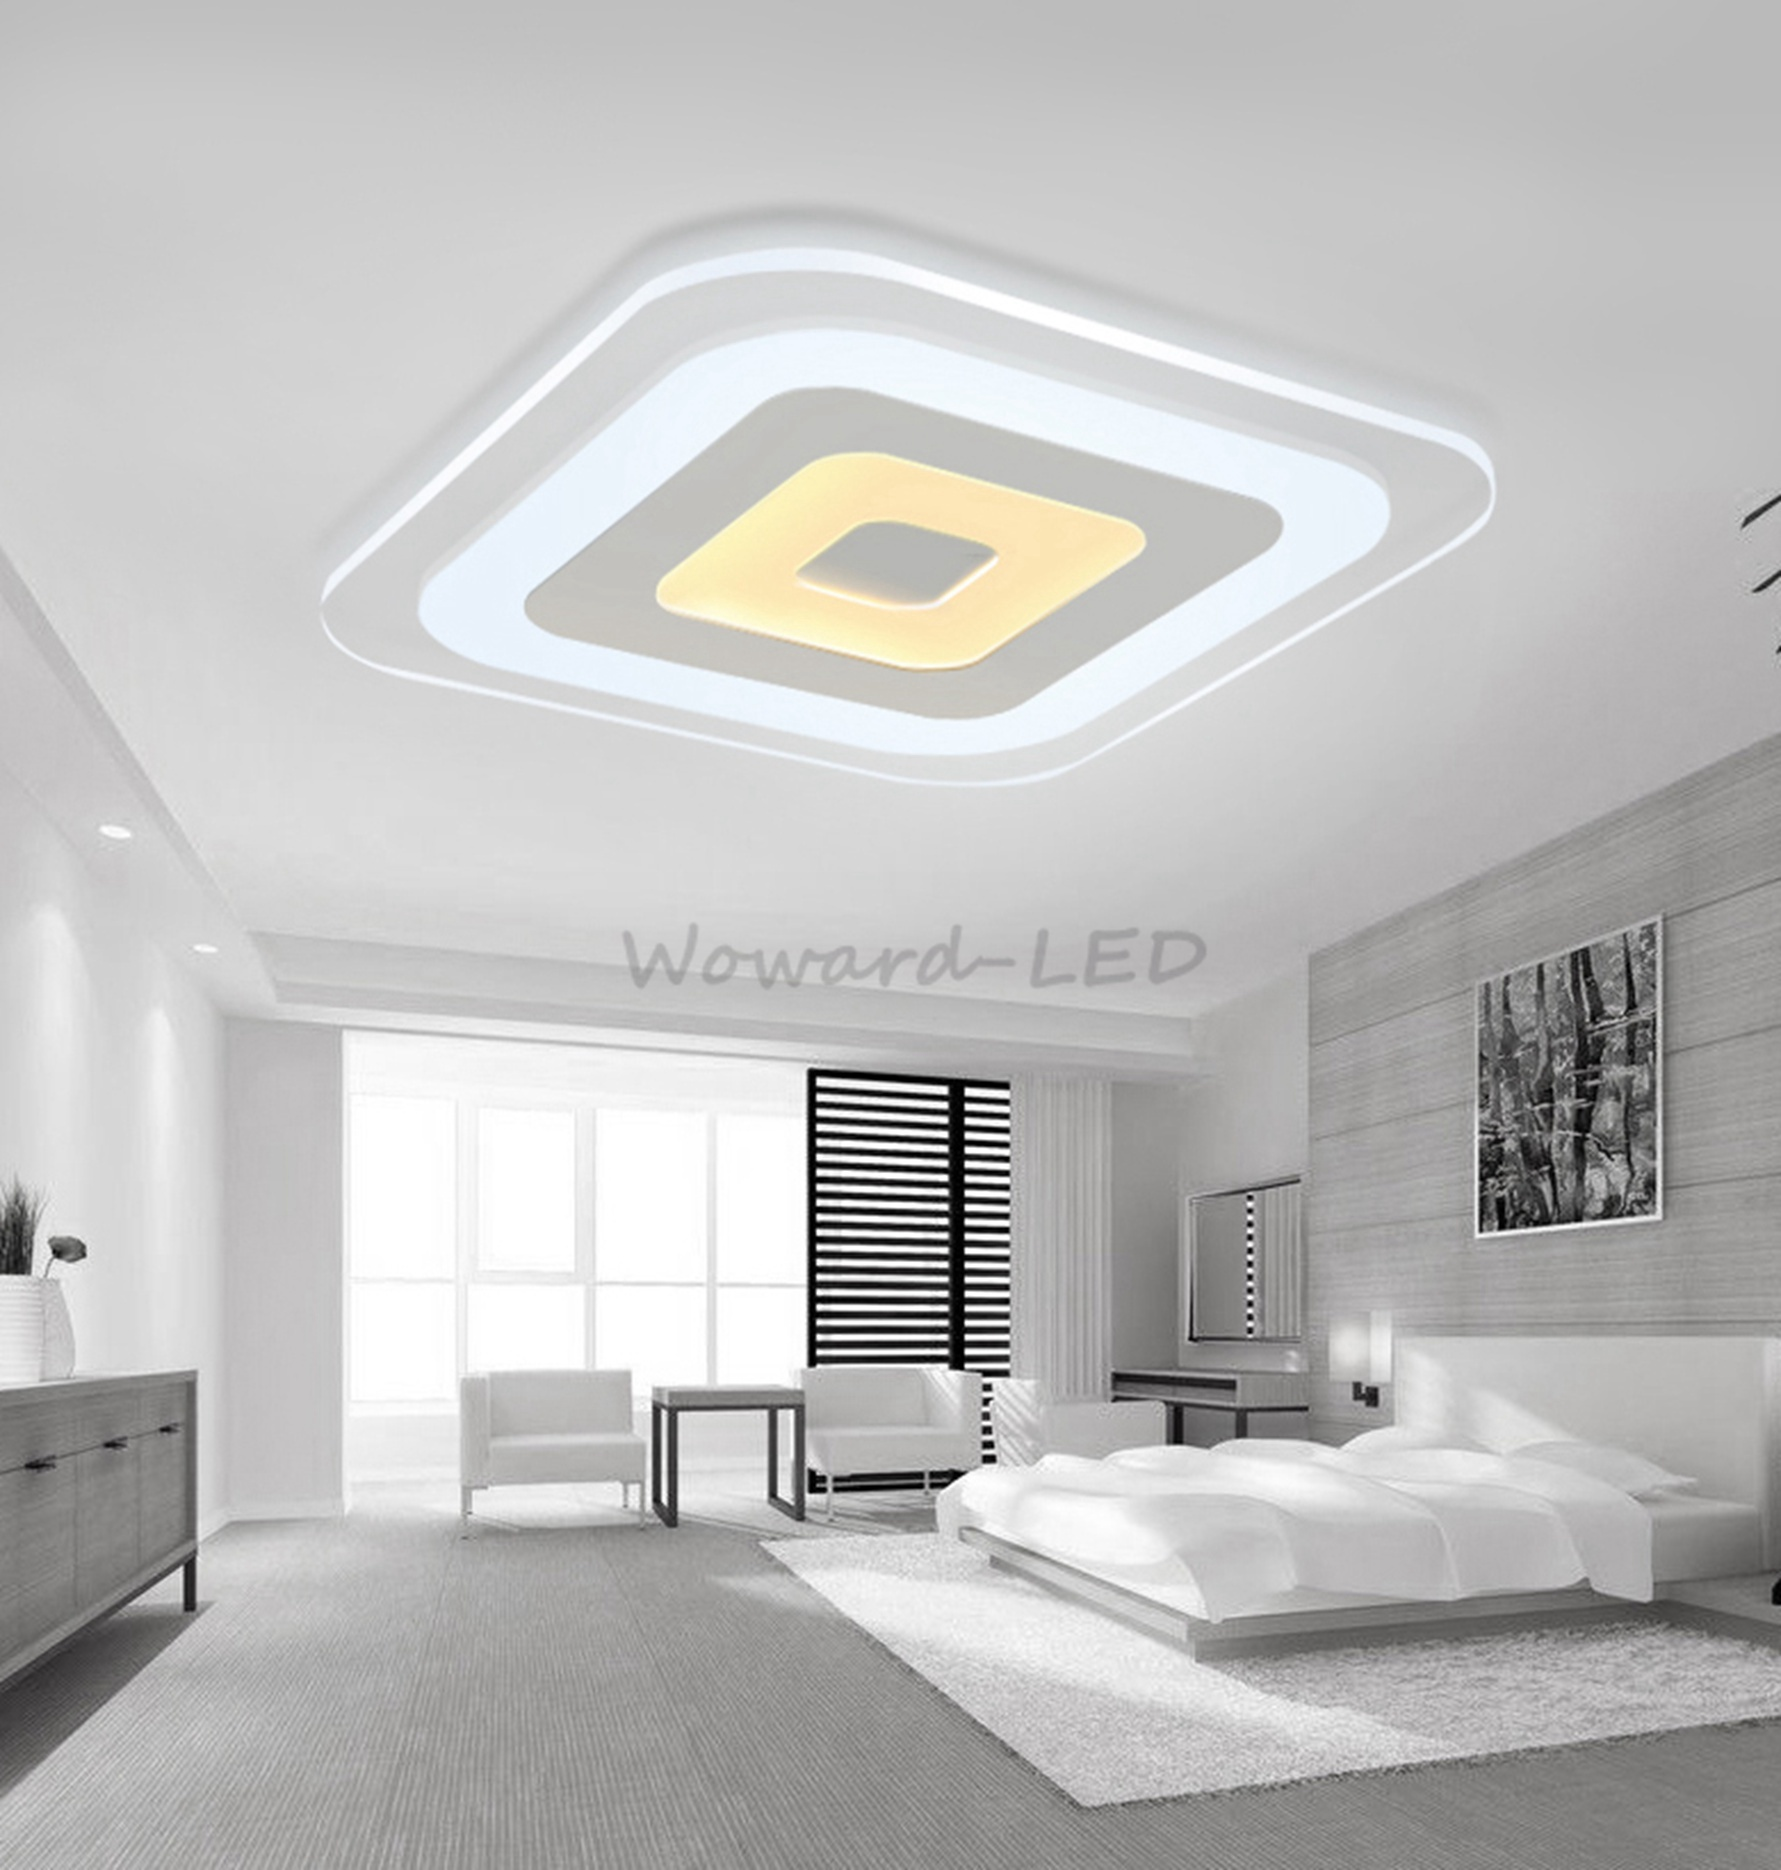 wow led deckenlampe deckenleuchte 16w bis 143w dimmbar lampe beleuchtung ebay. Black Bedroom Furniture Sets. Home Design Ideas